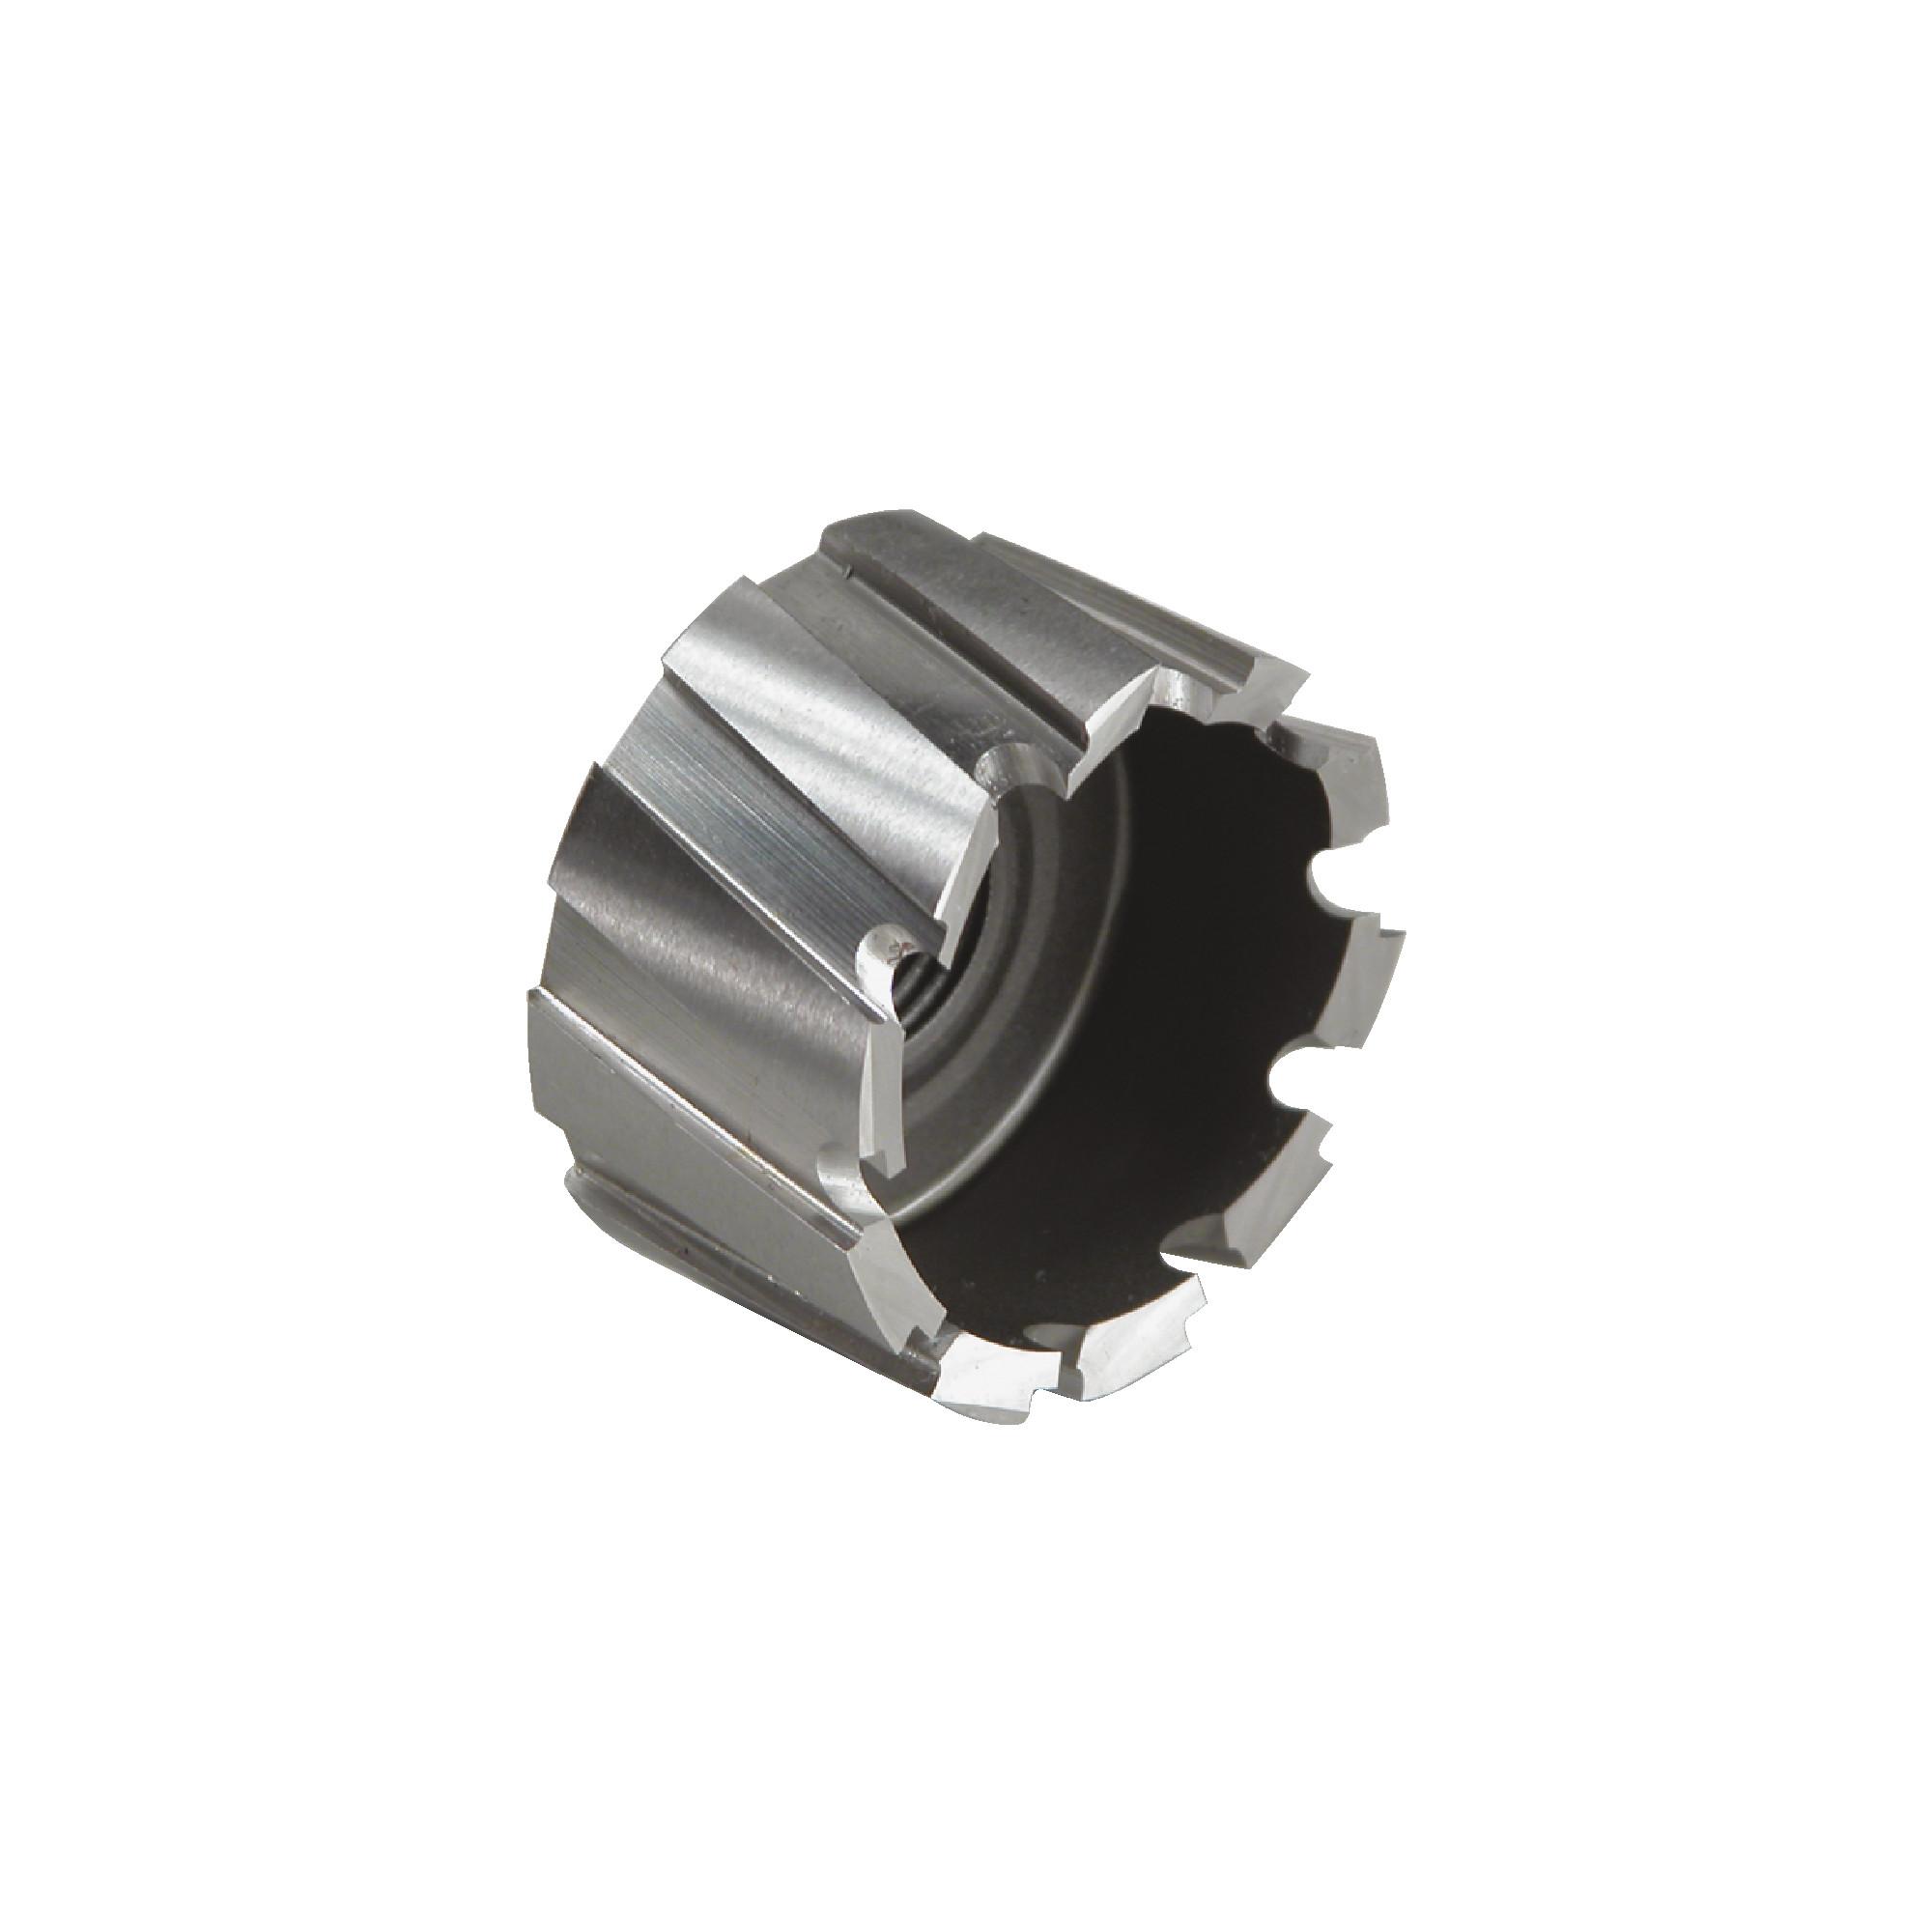 RotaCut™ Sheet Metal Annular Cutters